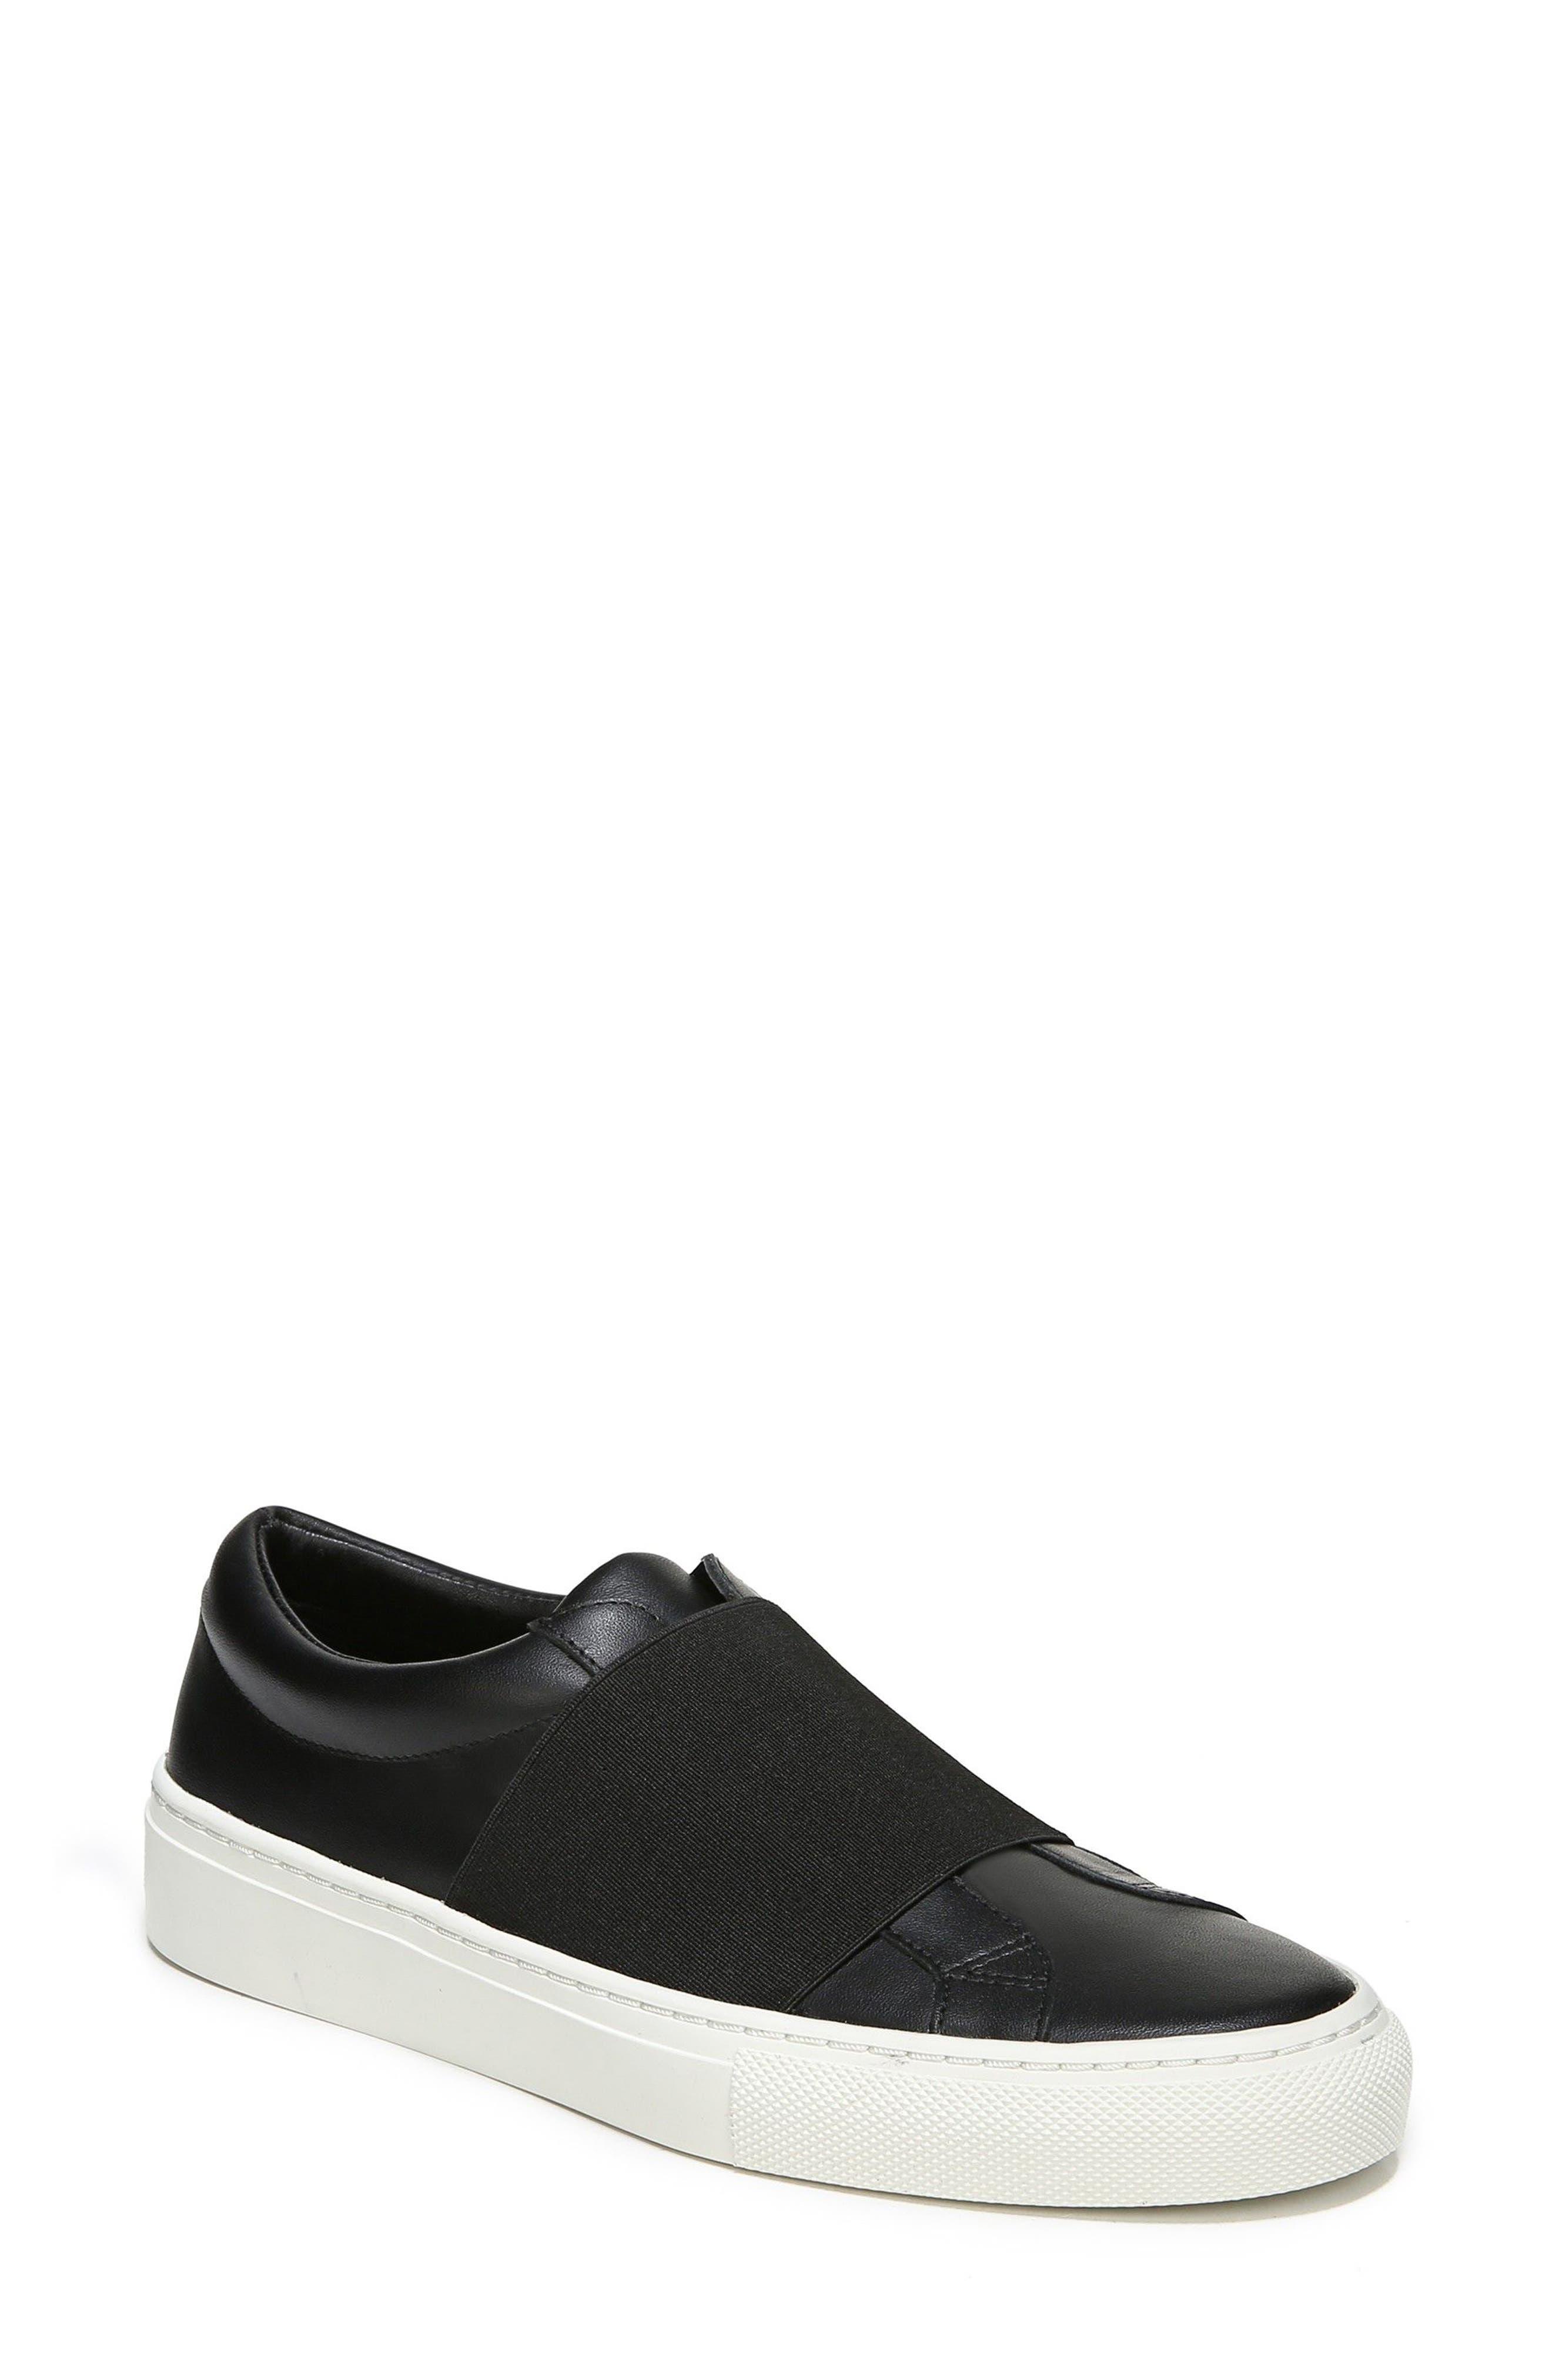 Saran Slip-On Sneaker,                             Main thumbnail 1, color,                             003